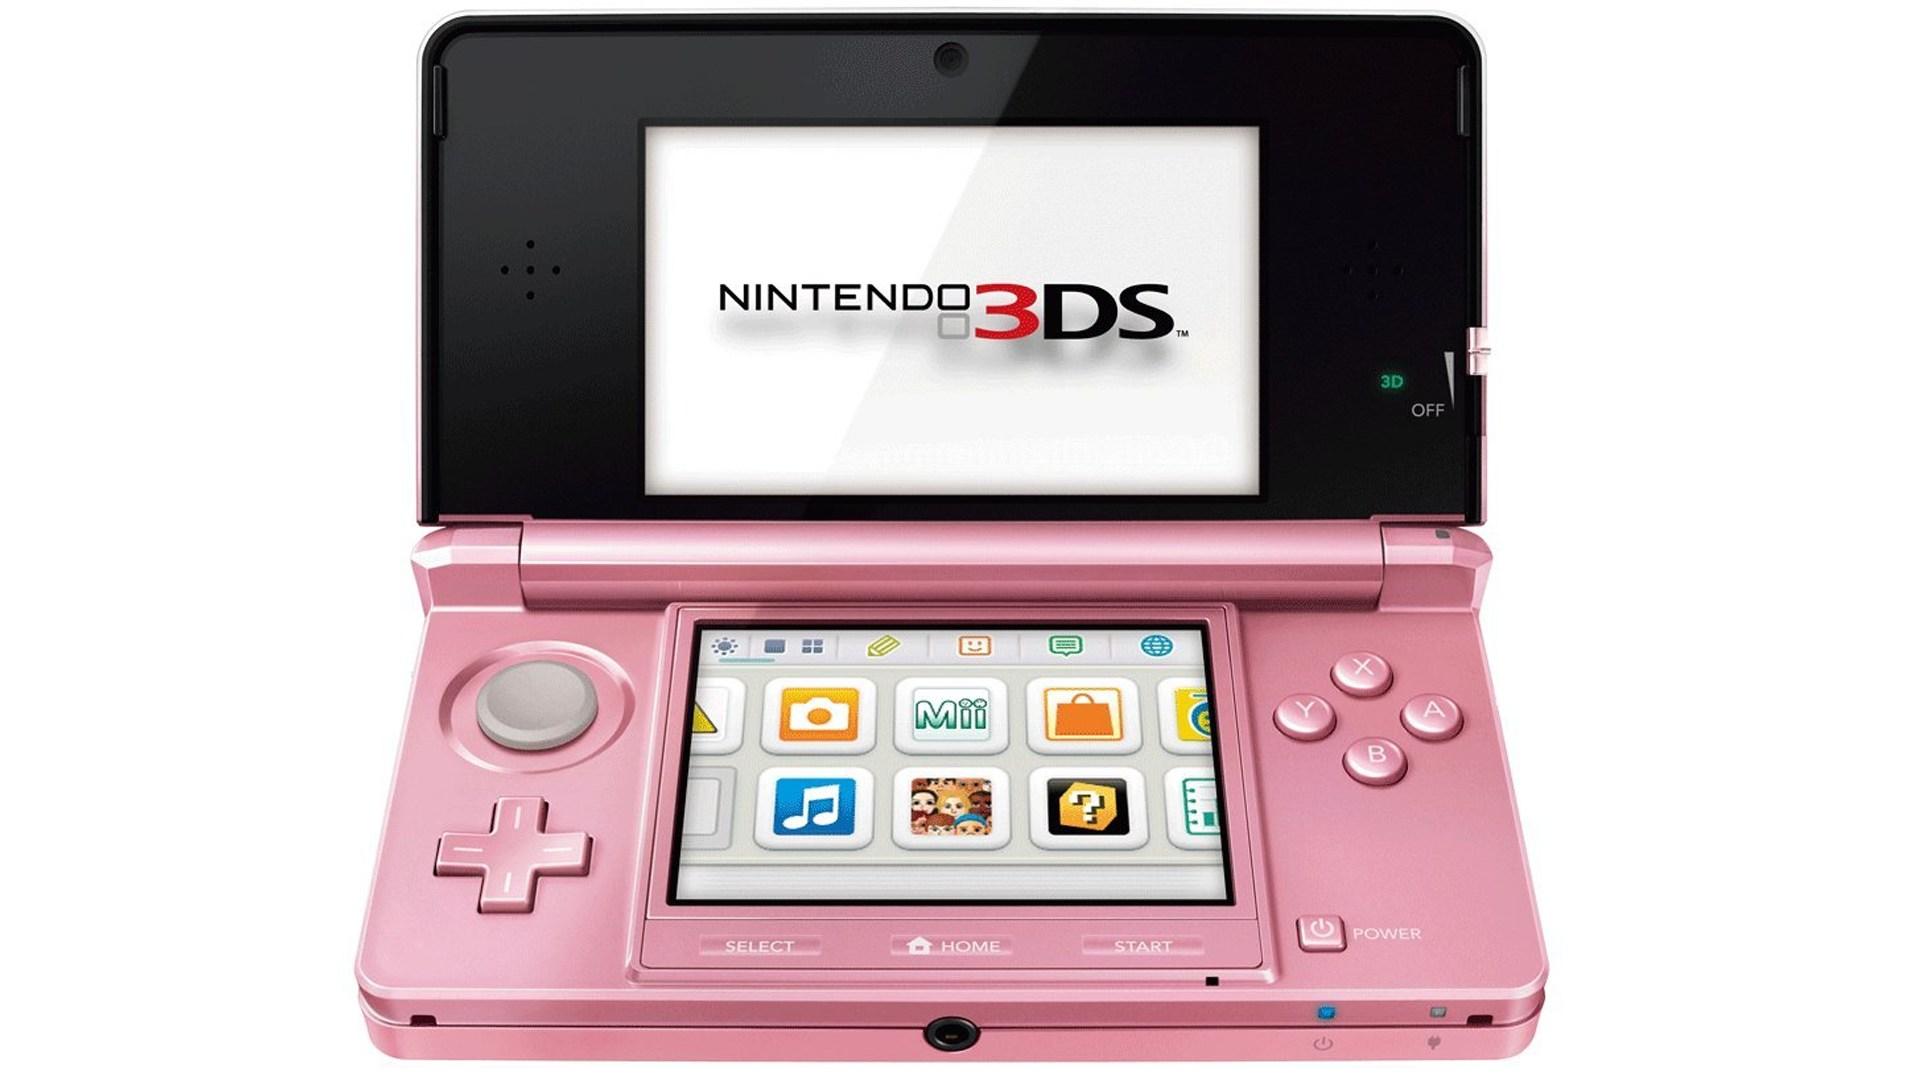 Nintendo, Spielekonsole, Handheld, 3ds